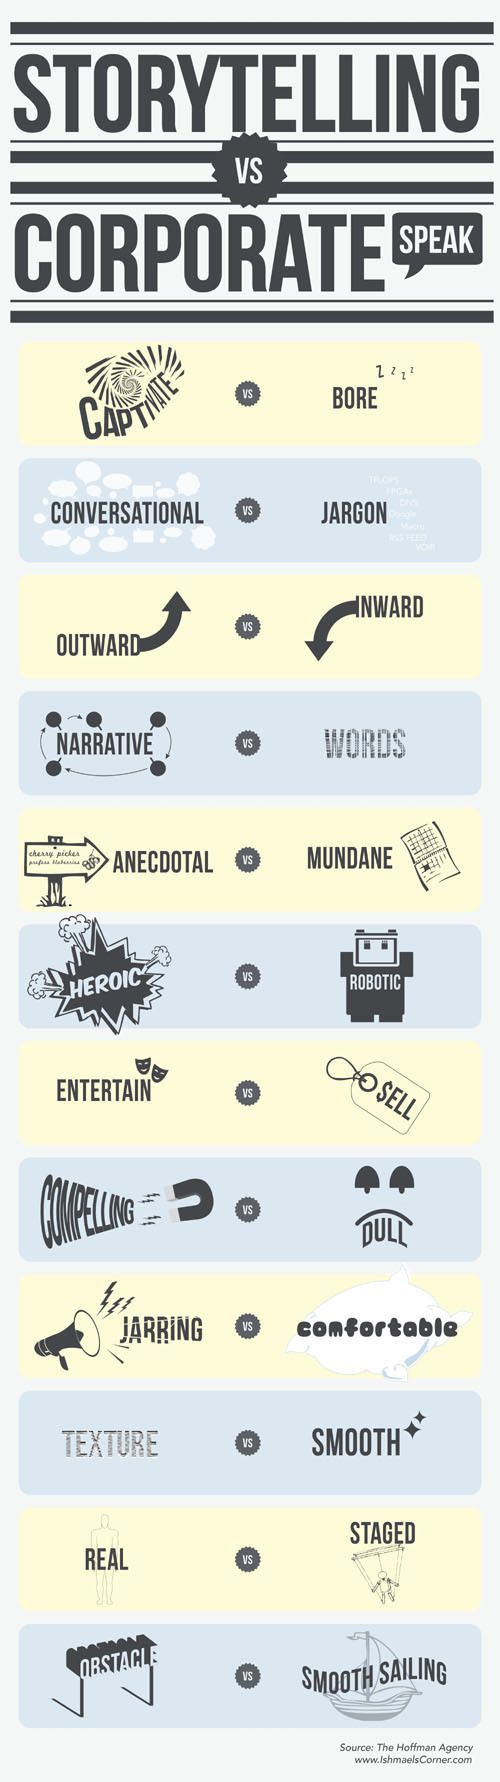 Storytelling VS Corporate speak